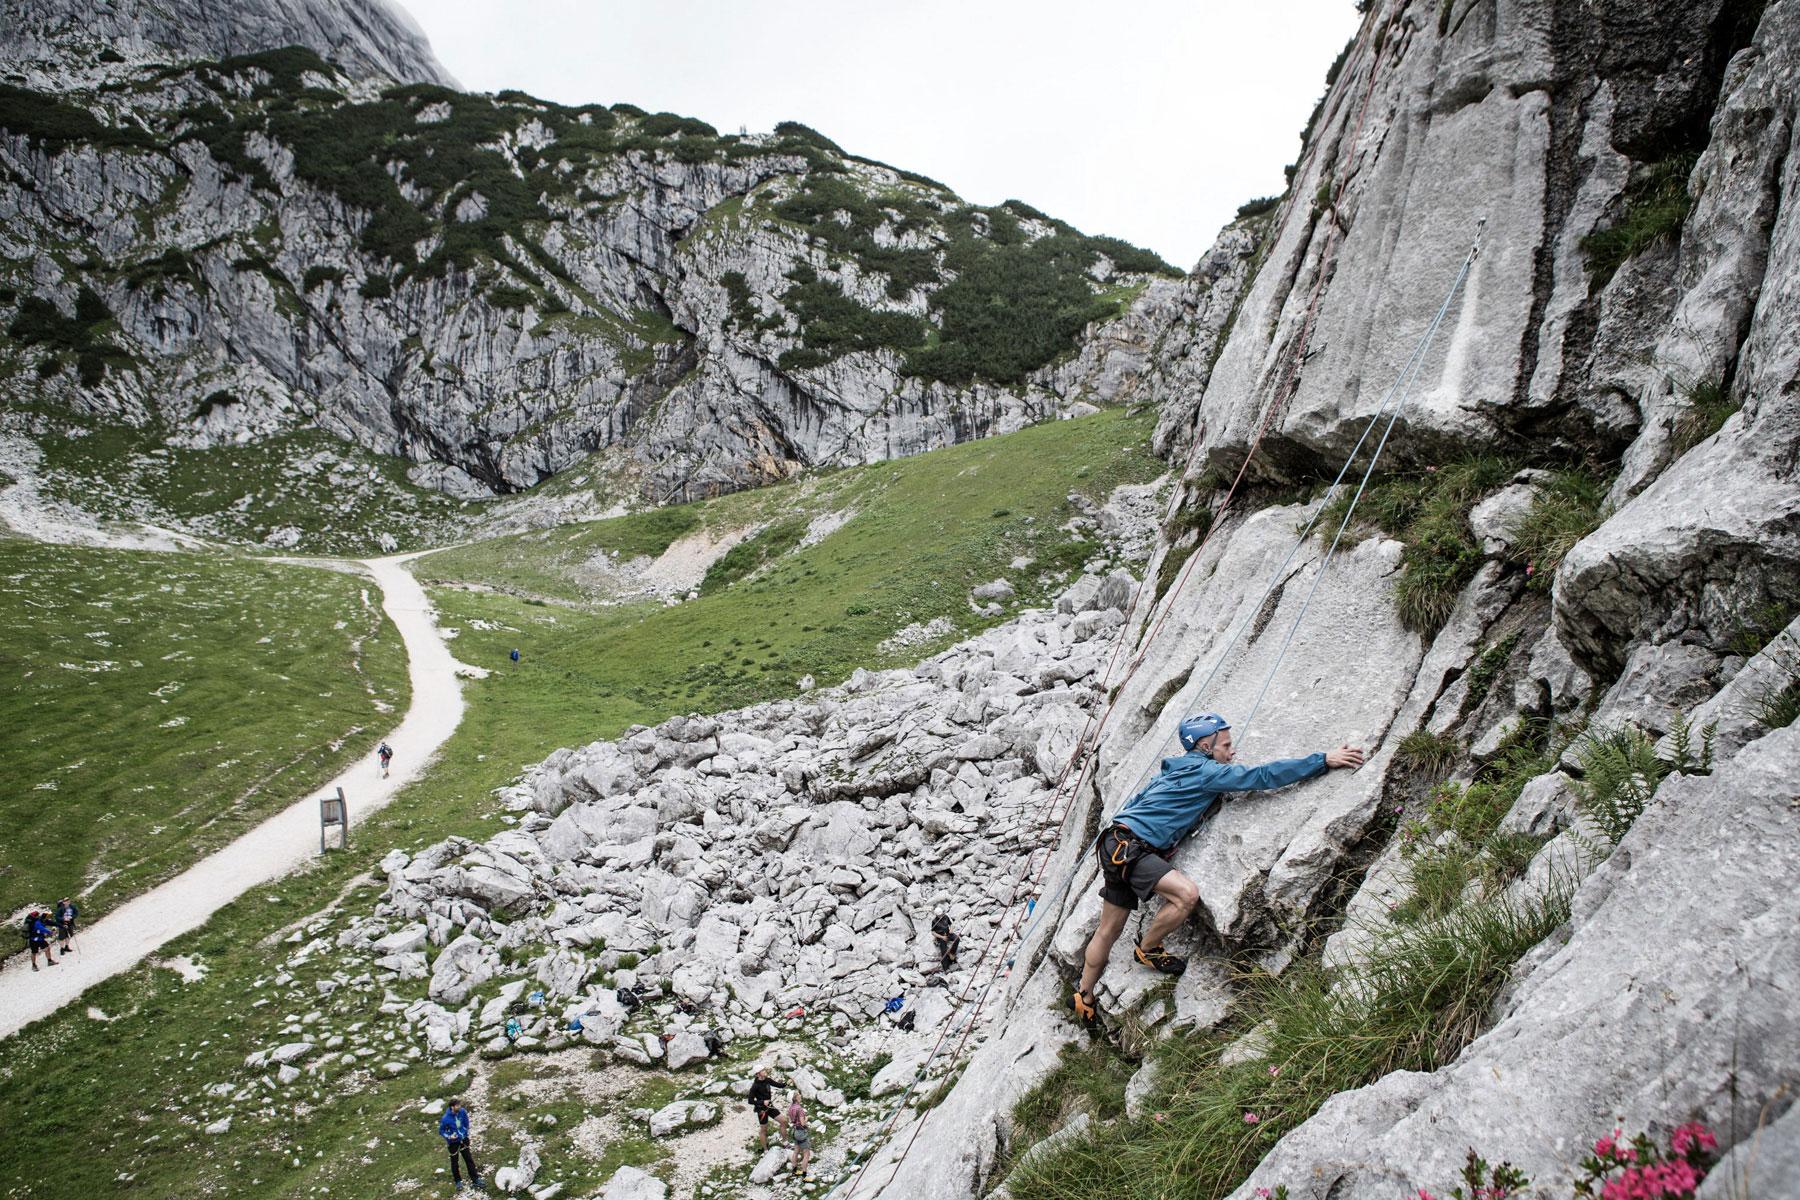 alentestival-2017-klettern